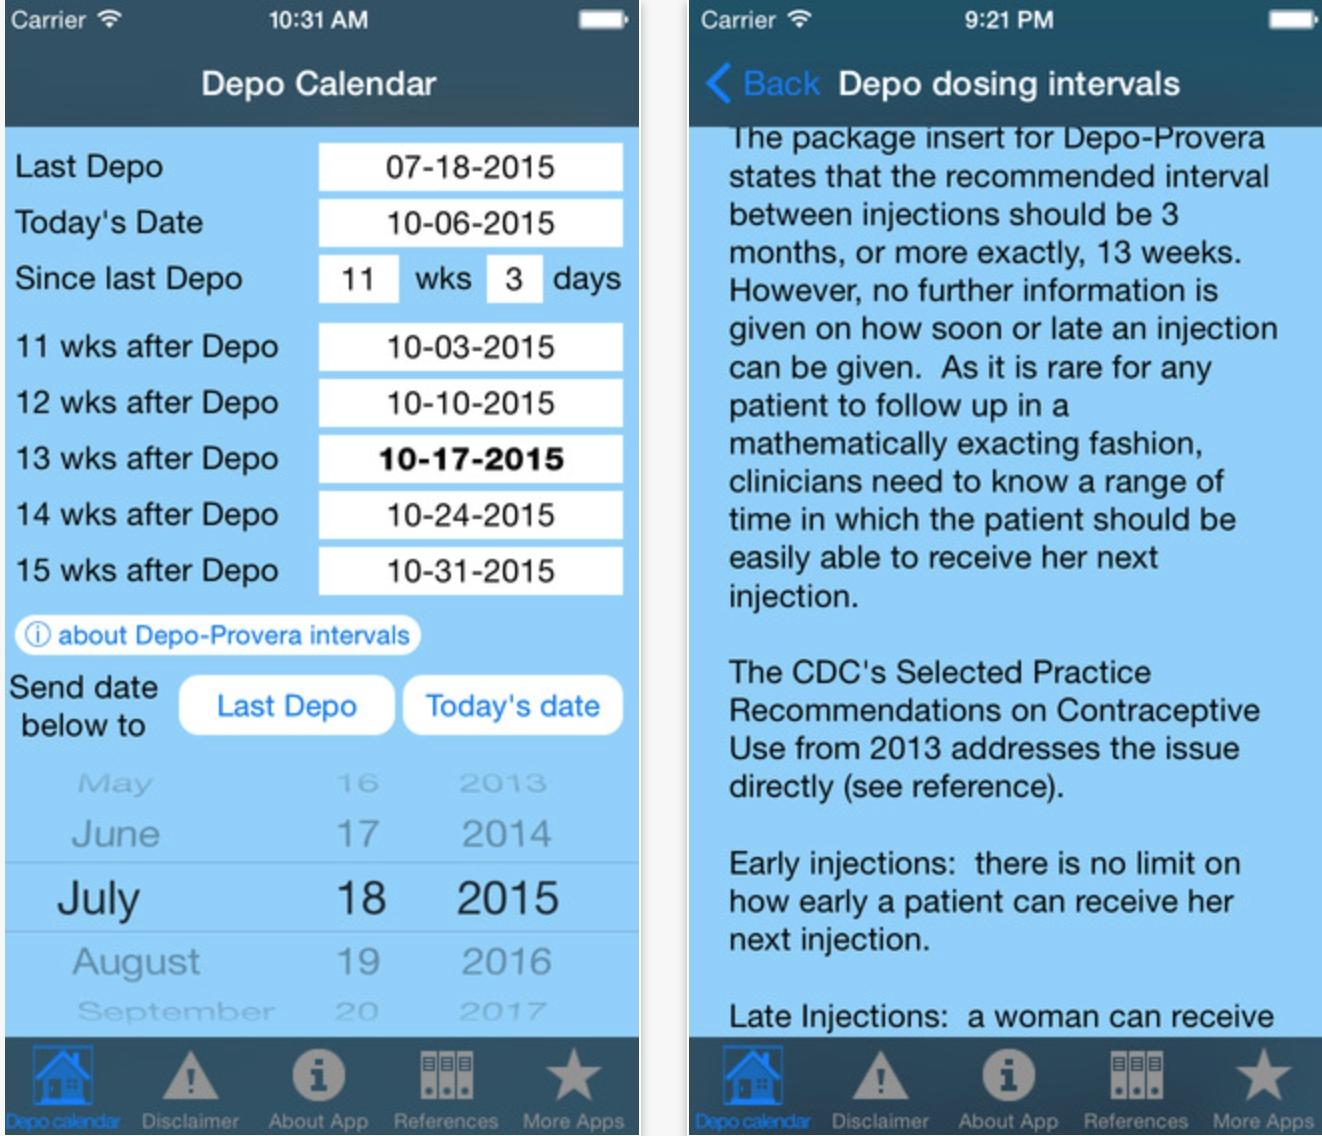 Depo Calendar App Could Significantly Improve Contraception  Depo Provera Inj Calendar